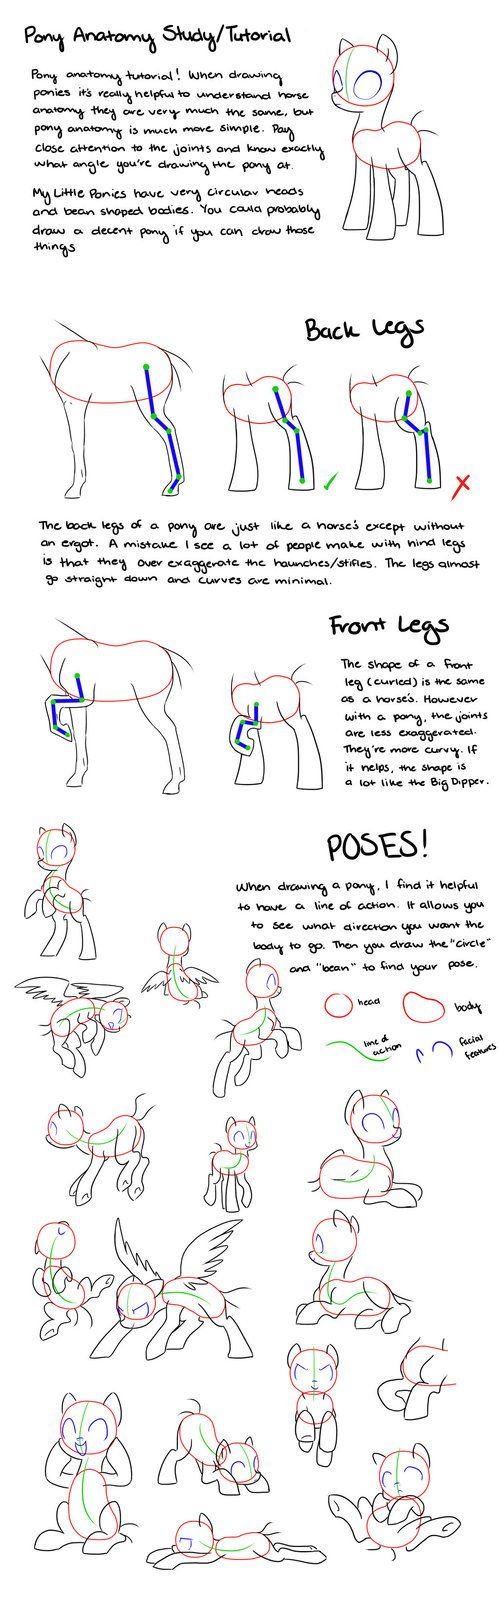 Pony Anatomy Tipsstudytutorial How To Draw Mlp Pinterest